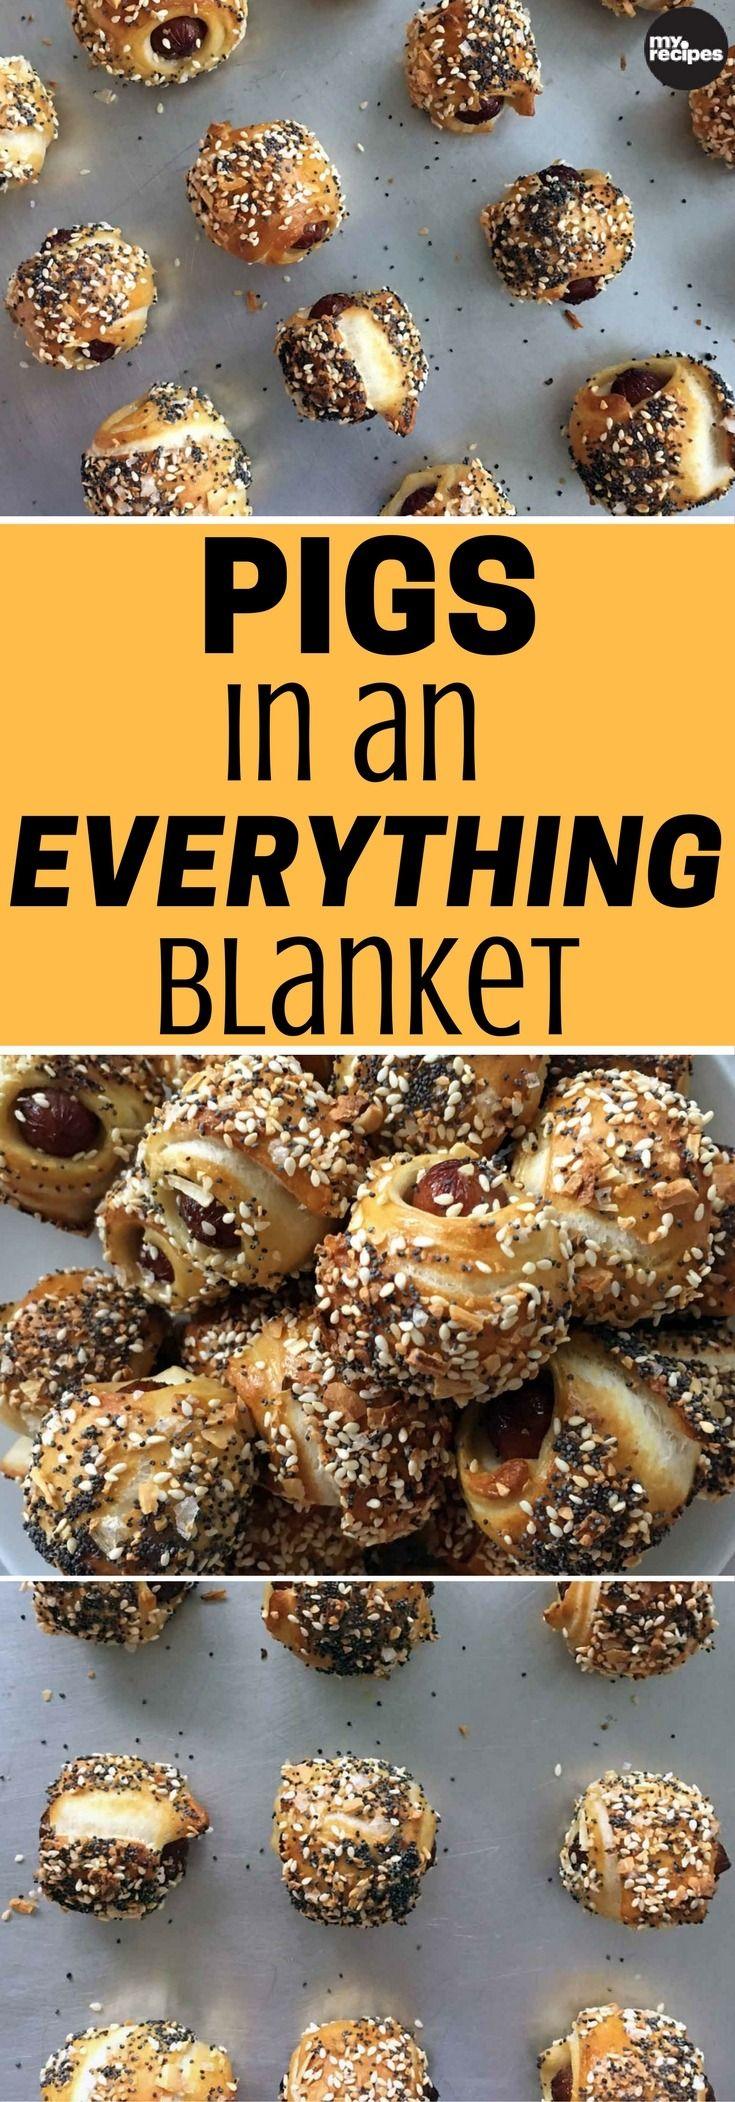 216 best appetizers images on pinterest   appetizer recipes